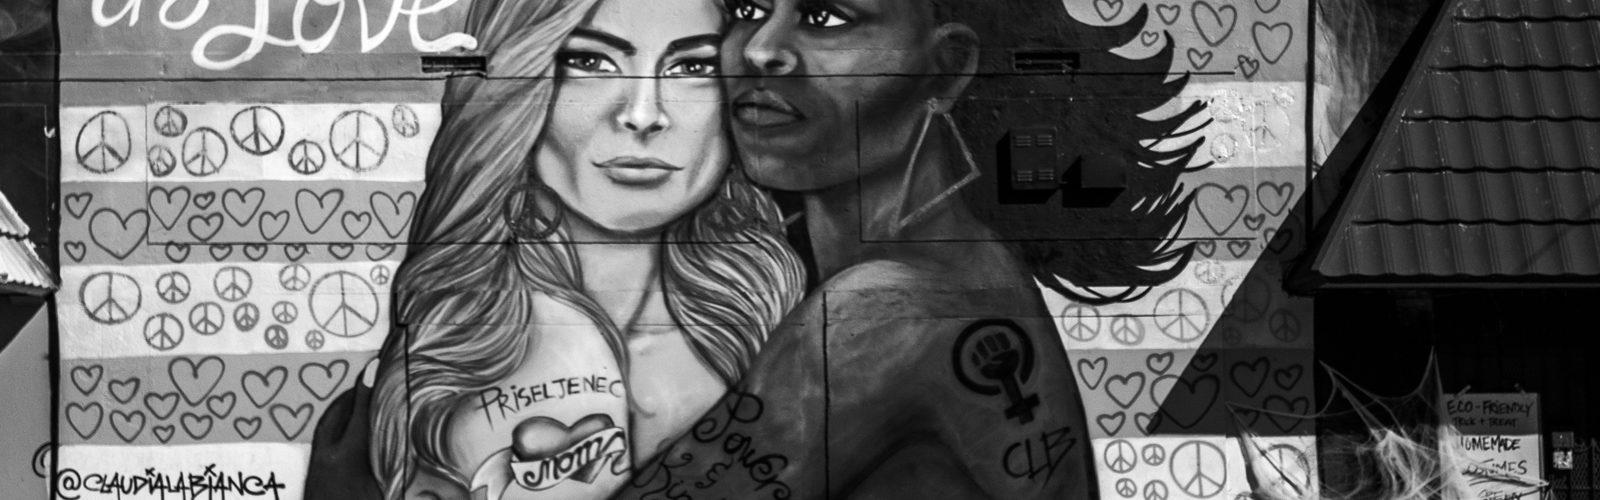 black sex-experts o-diaries